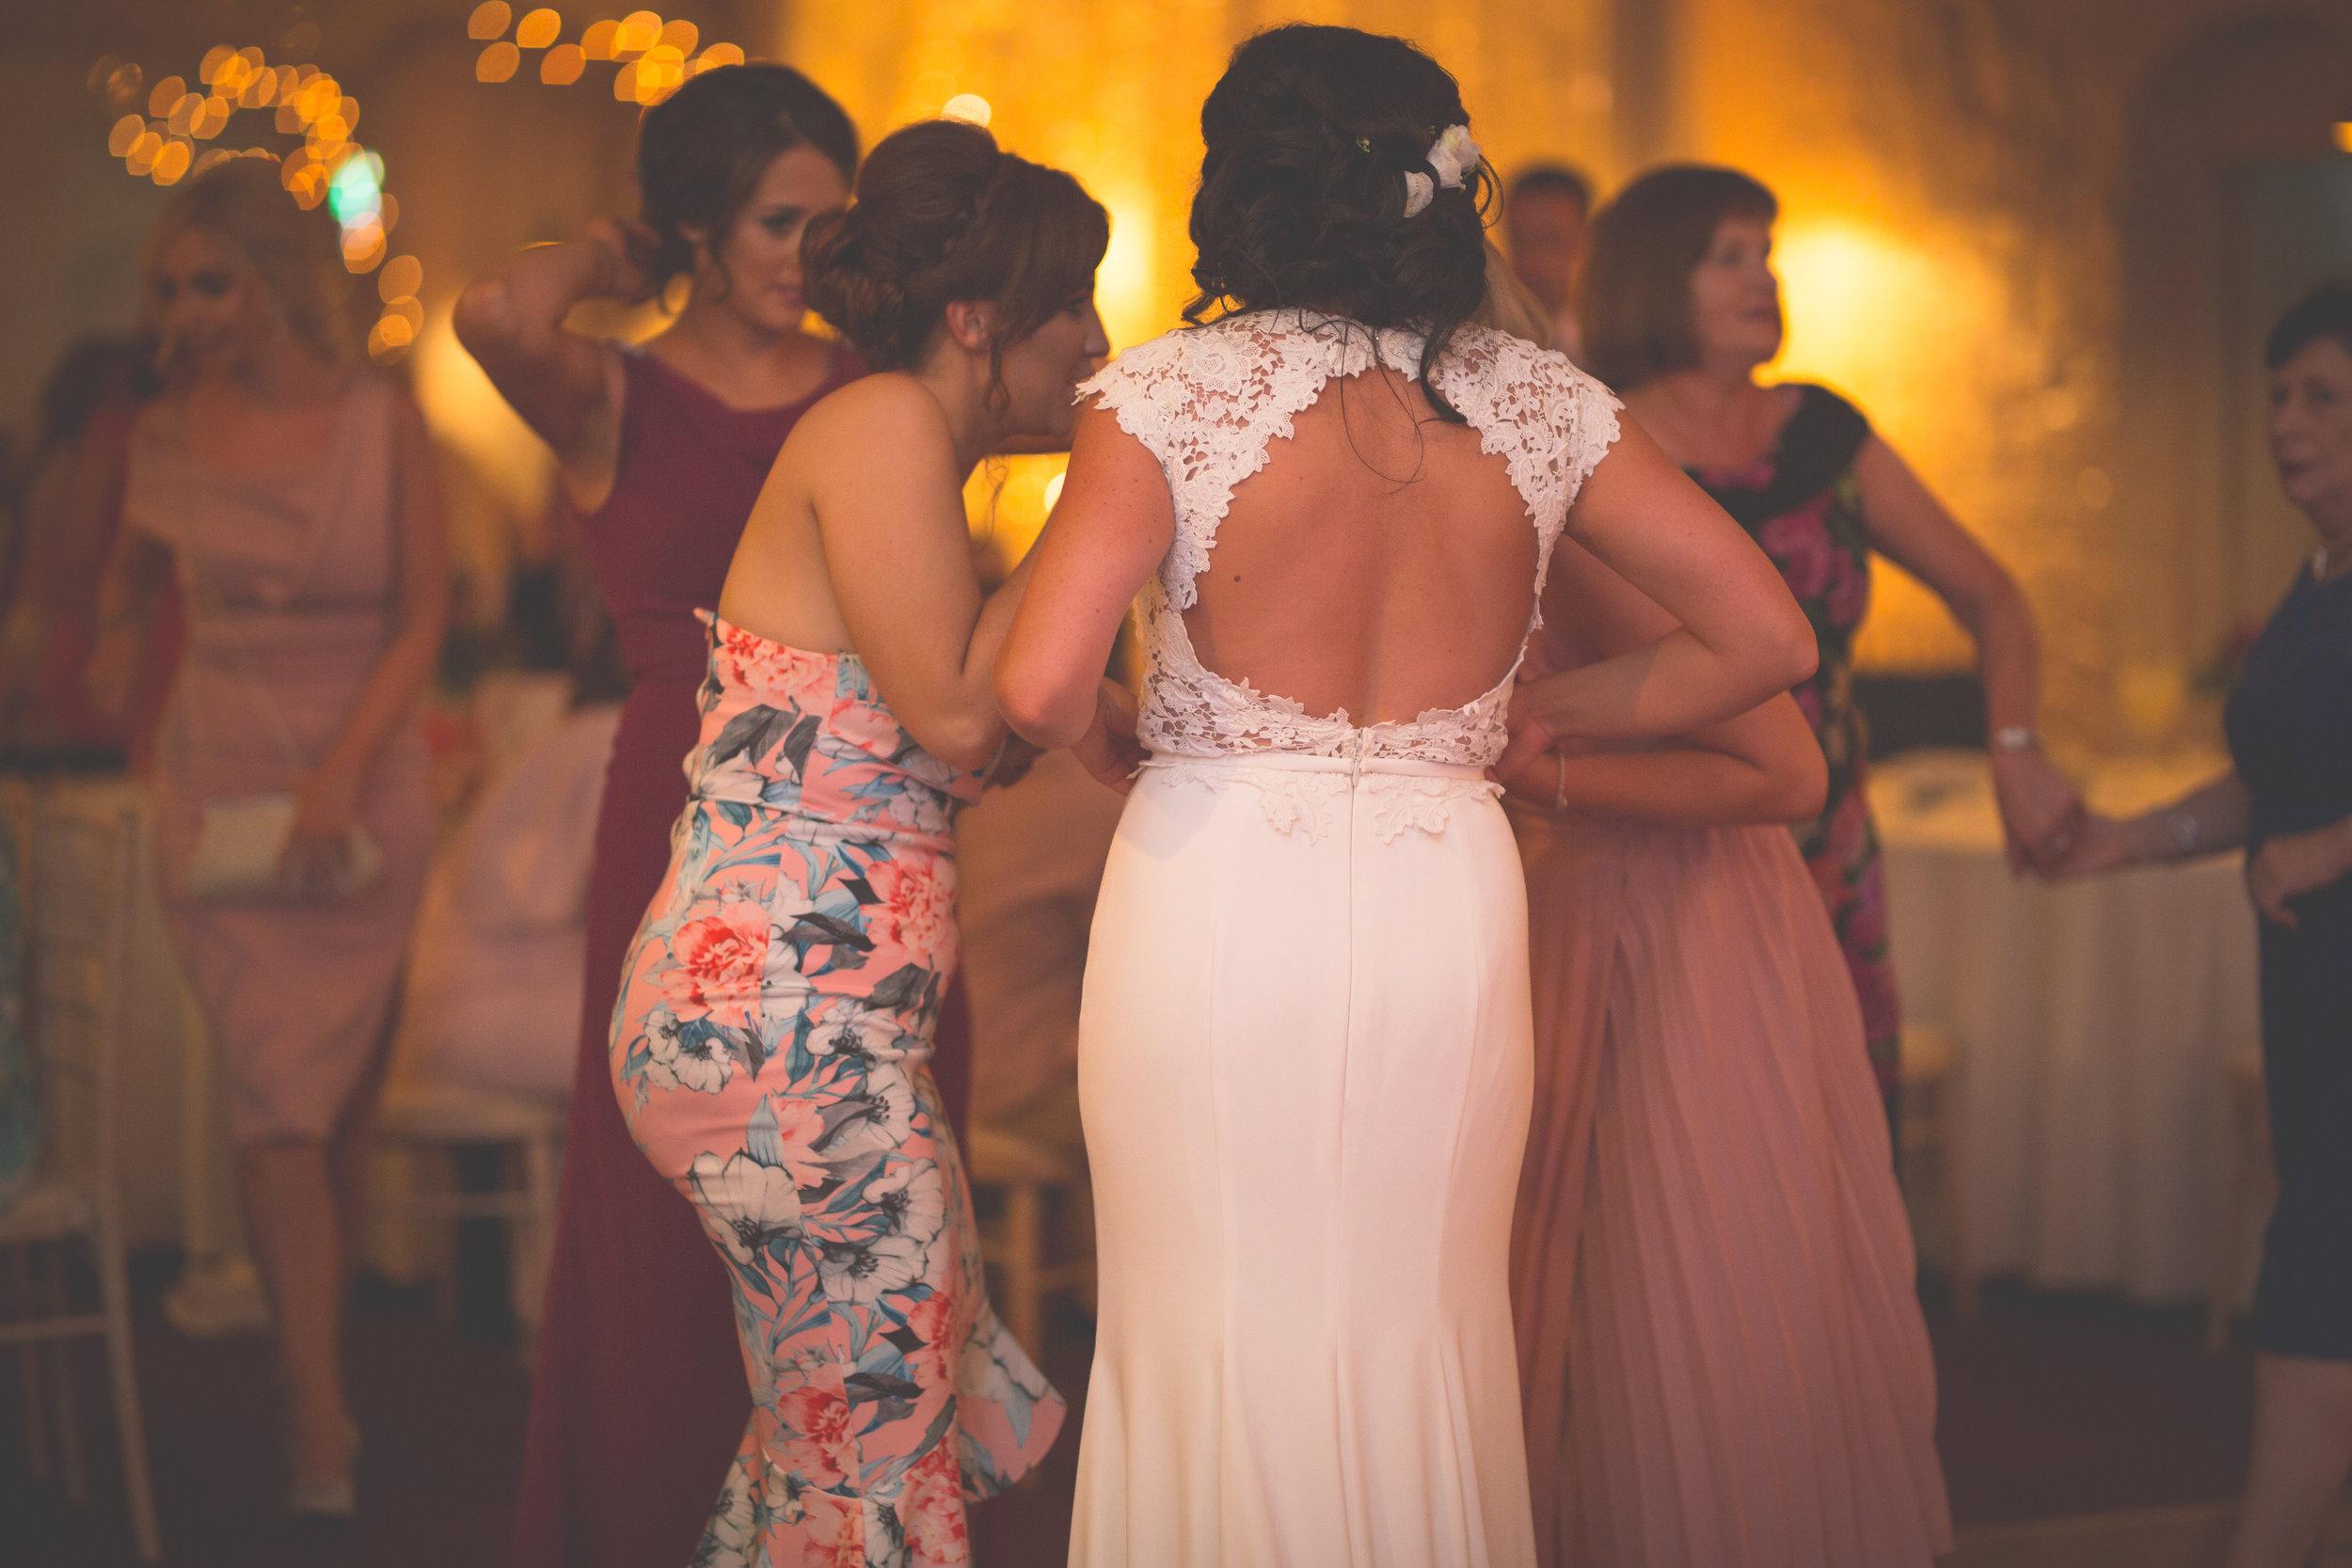 Brian McEwan Wedding Photography | Carol-Annee & Sean | The Dancing-95.jpg